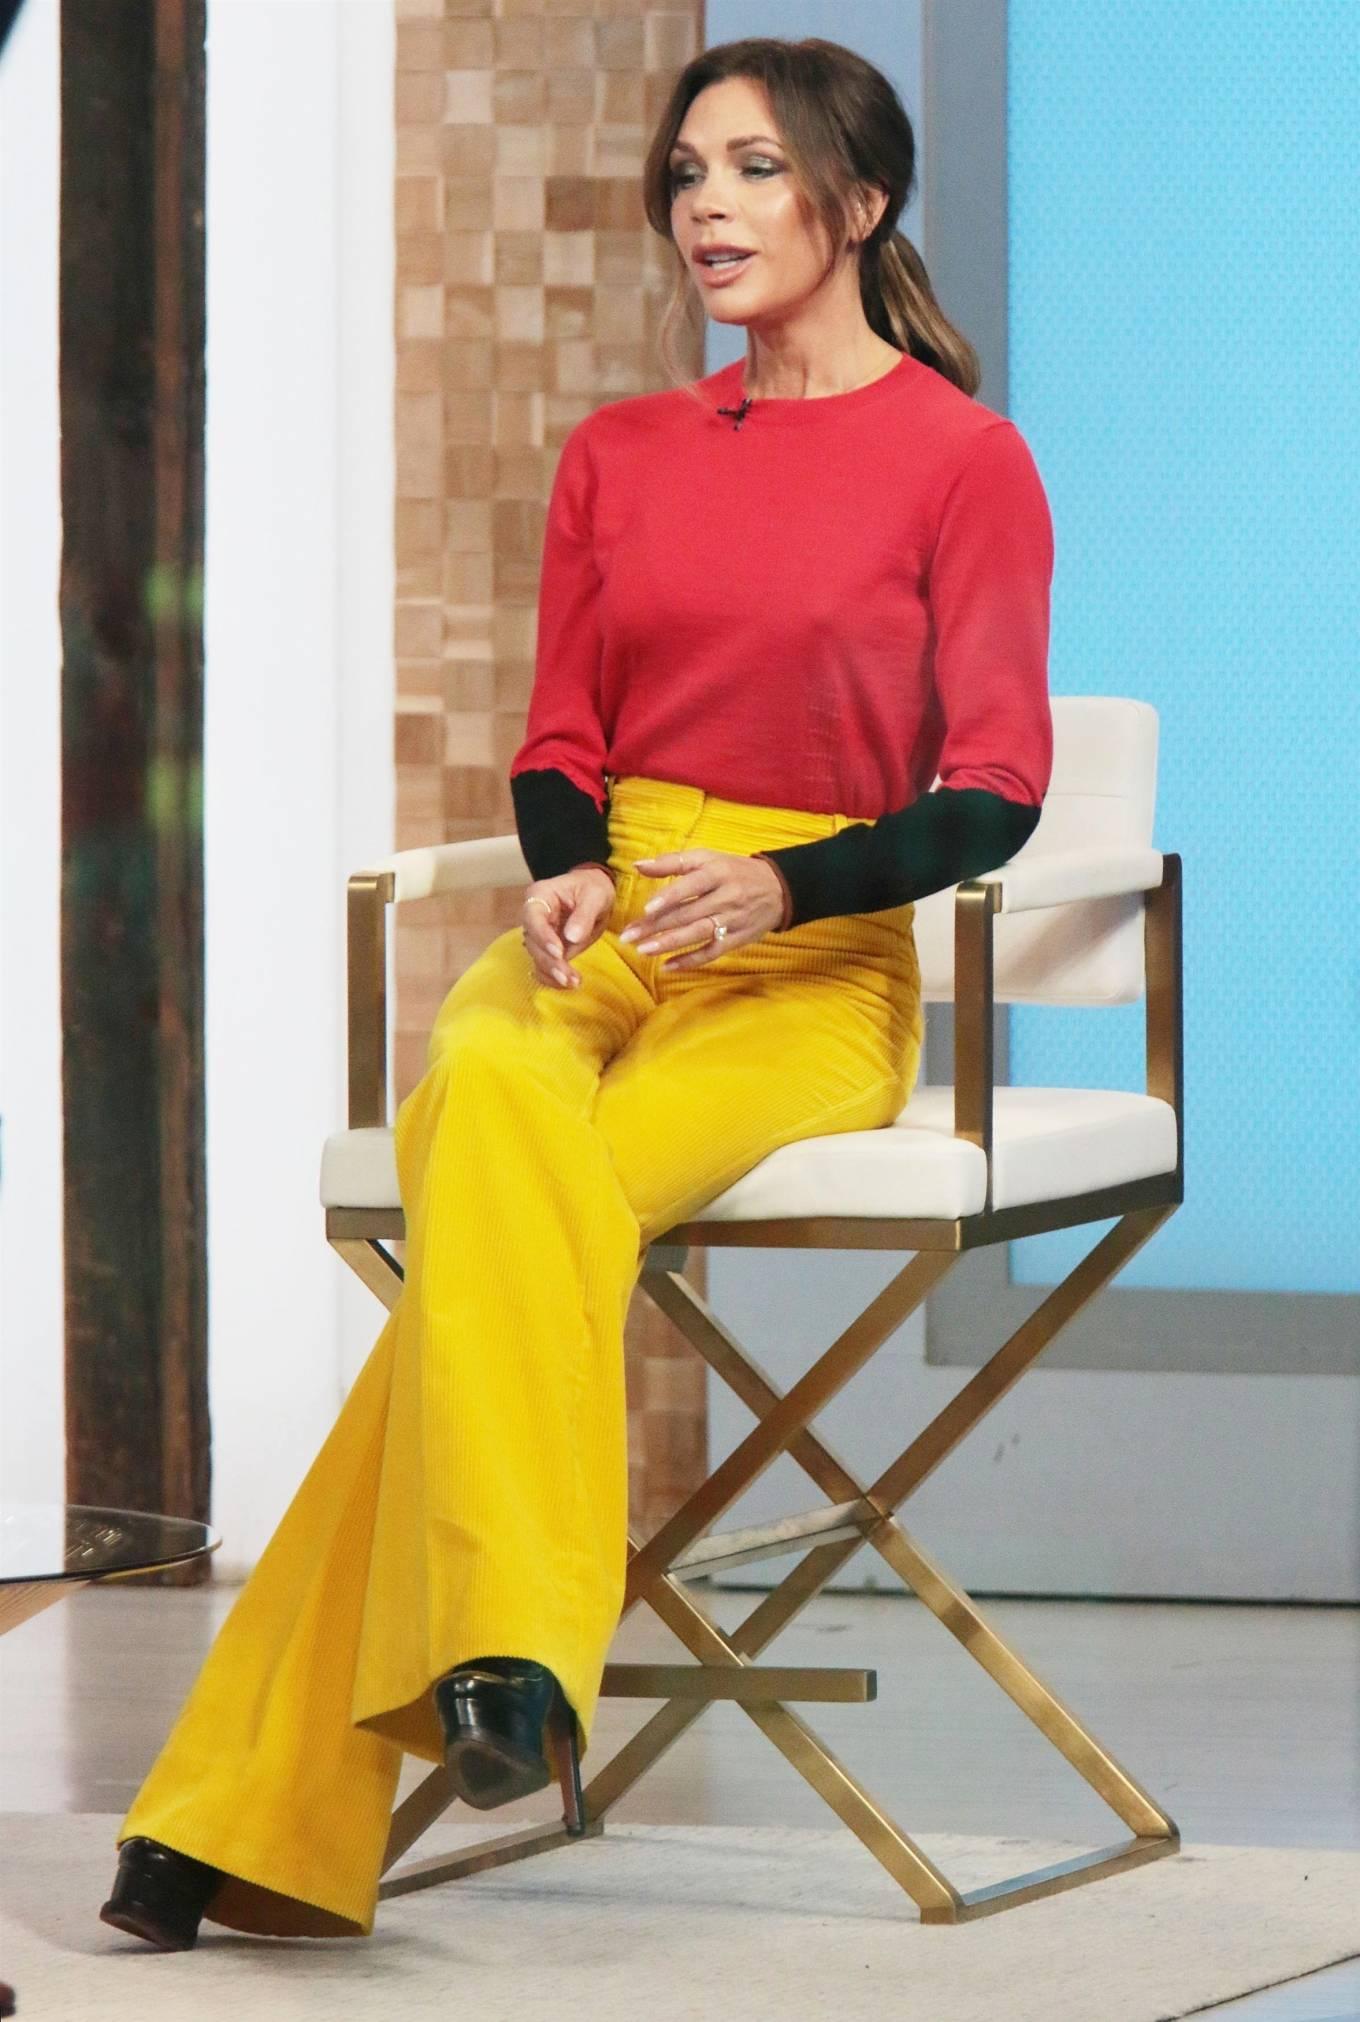 Victoria Beckham 2021 : Victoria Beckham – on Good Morning America promoting her new designer clothing in New York City-05